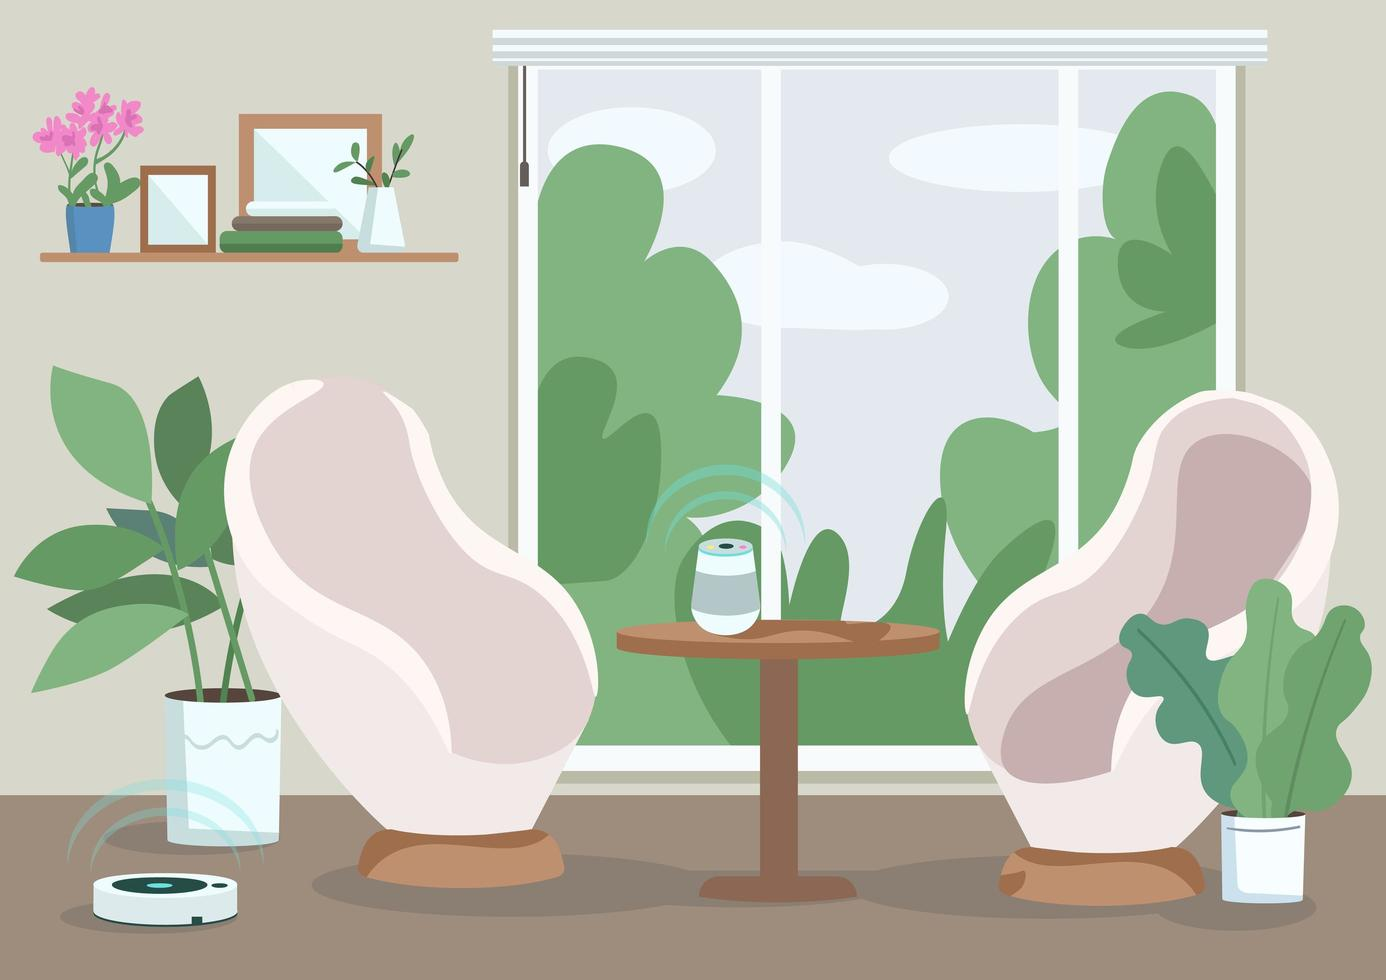 modernt hem vardagsrum vektor